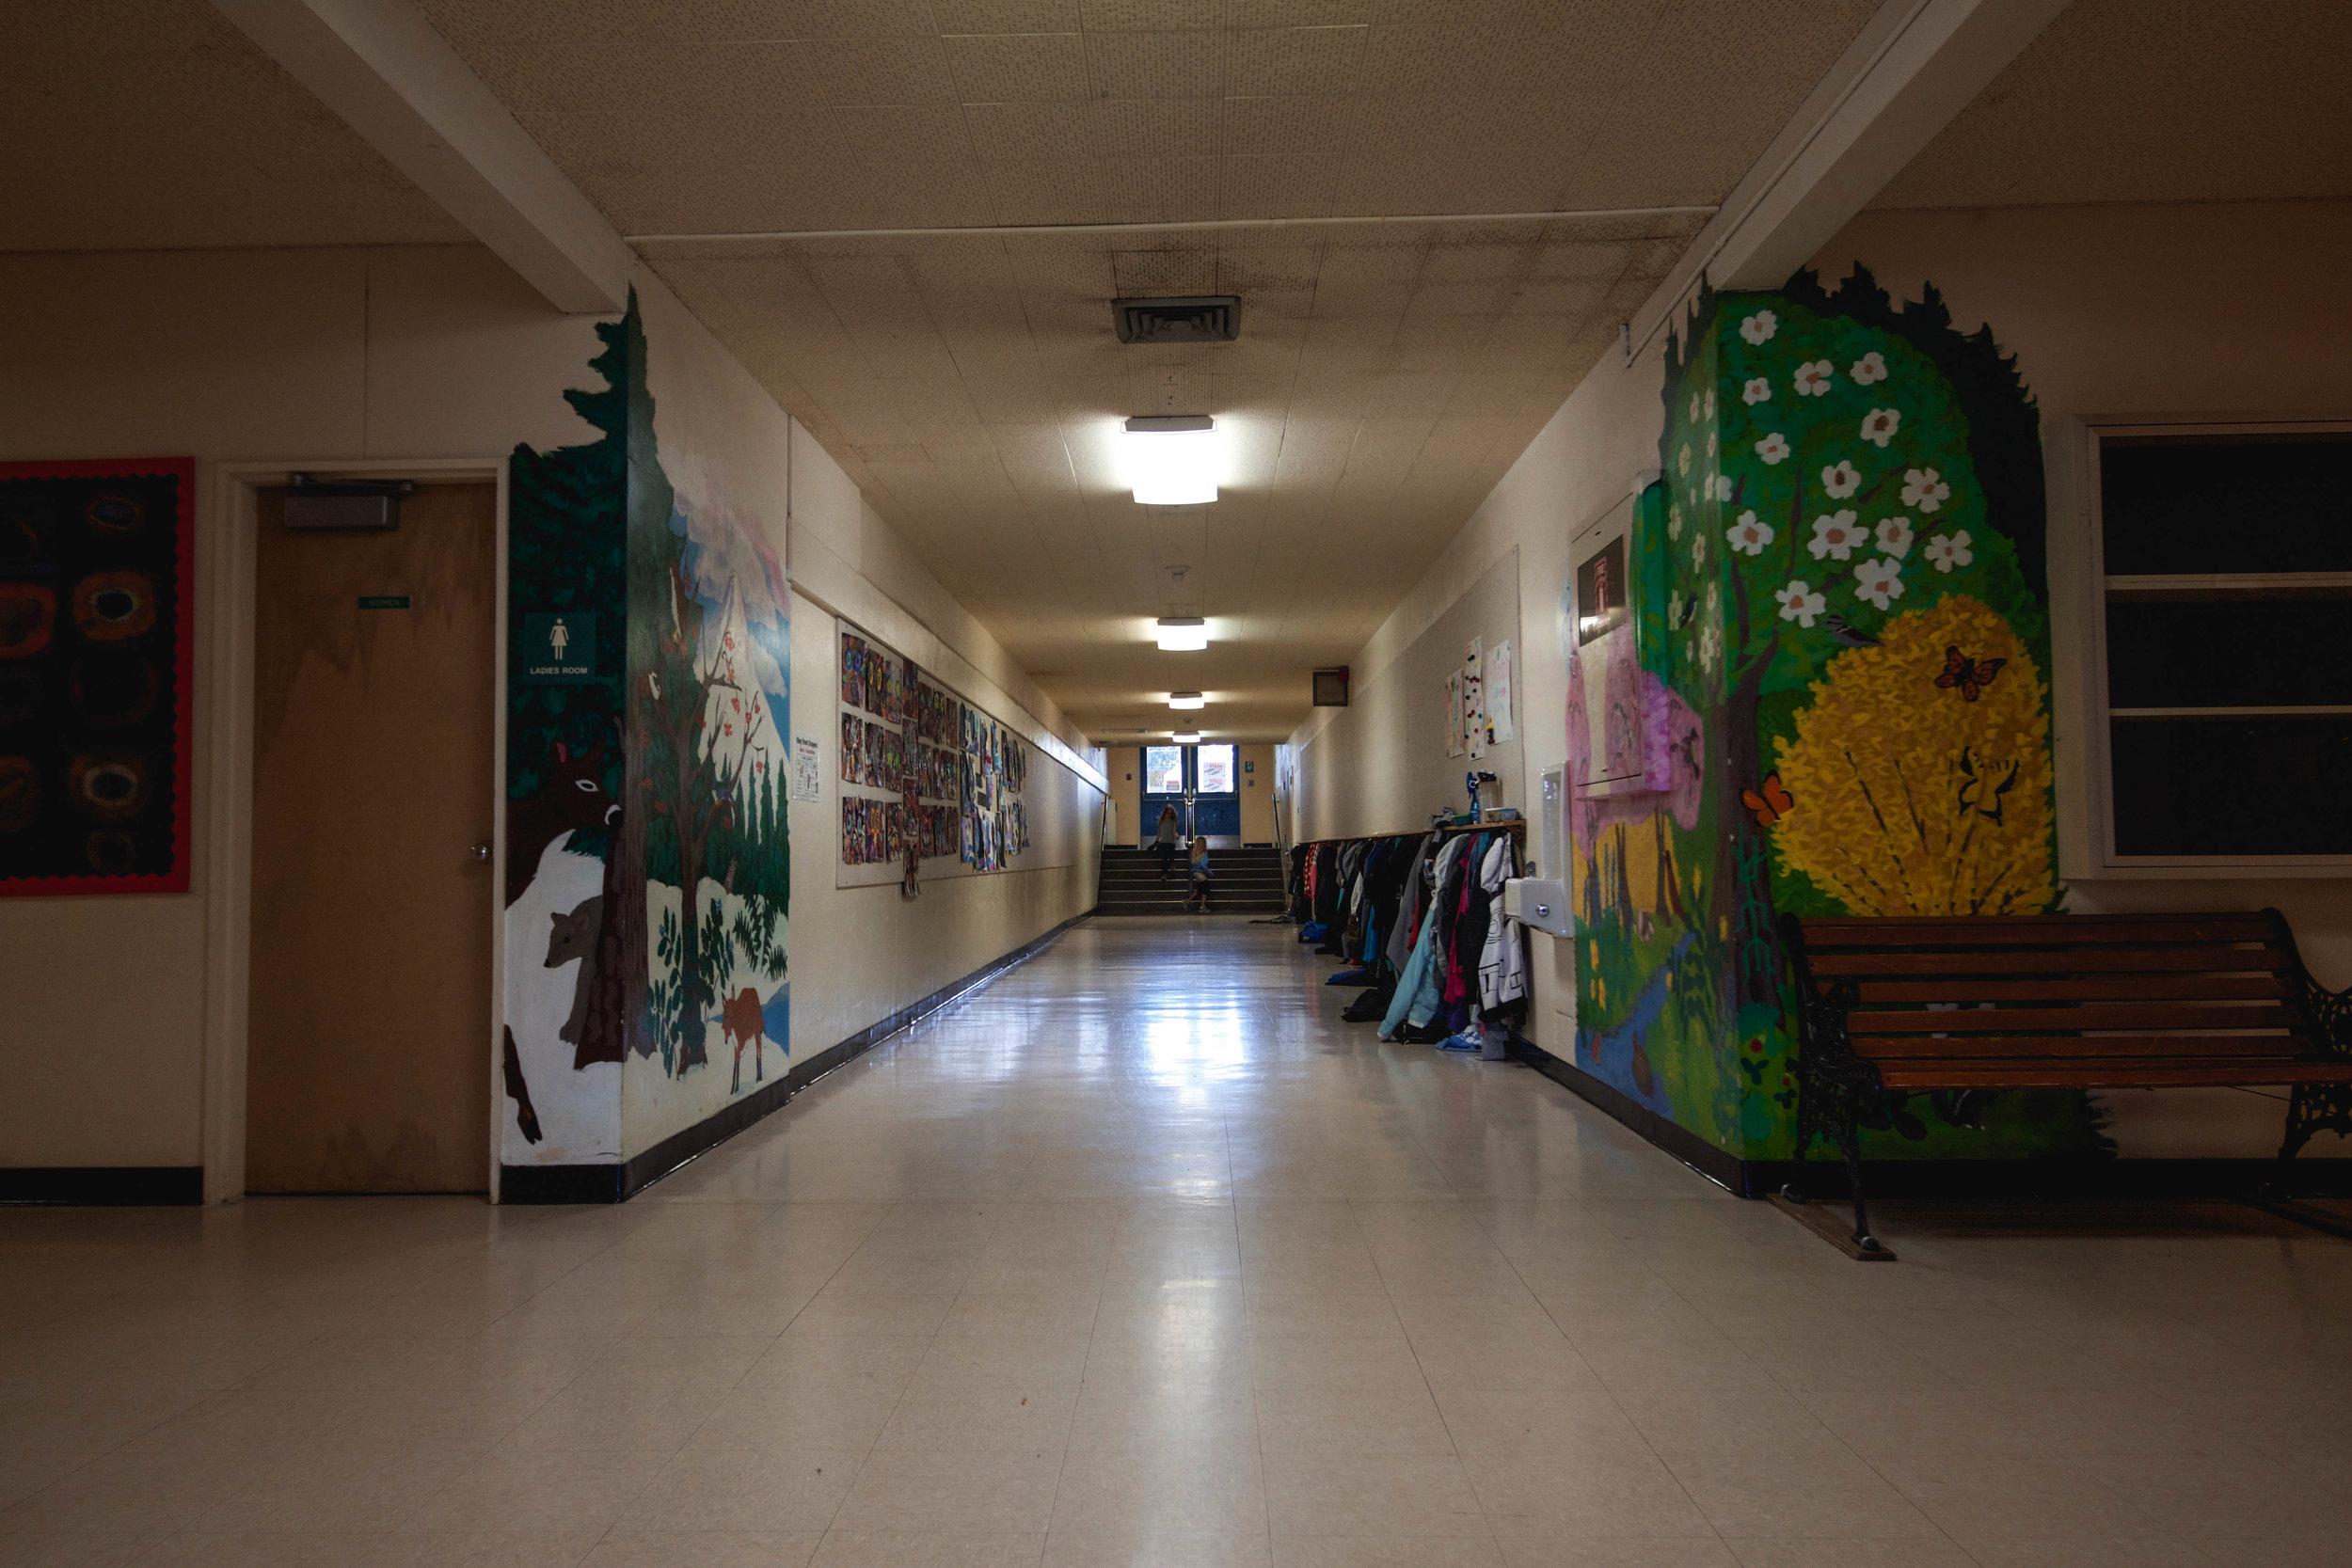 Halls and classes 15.jpg